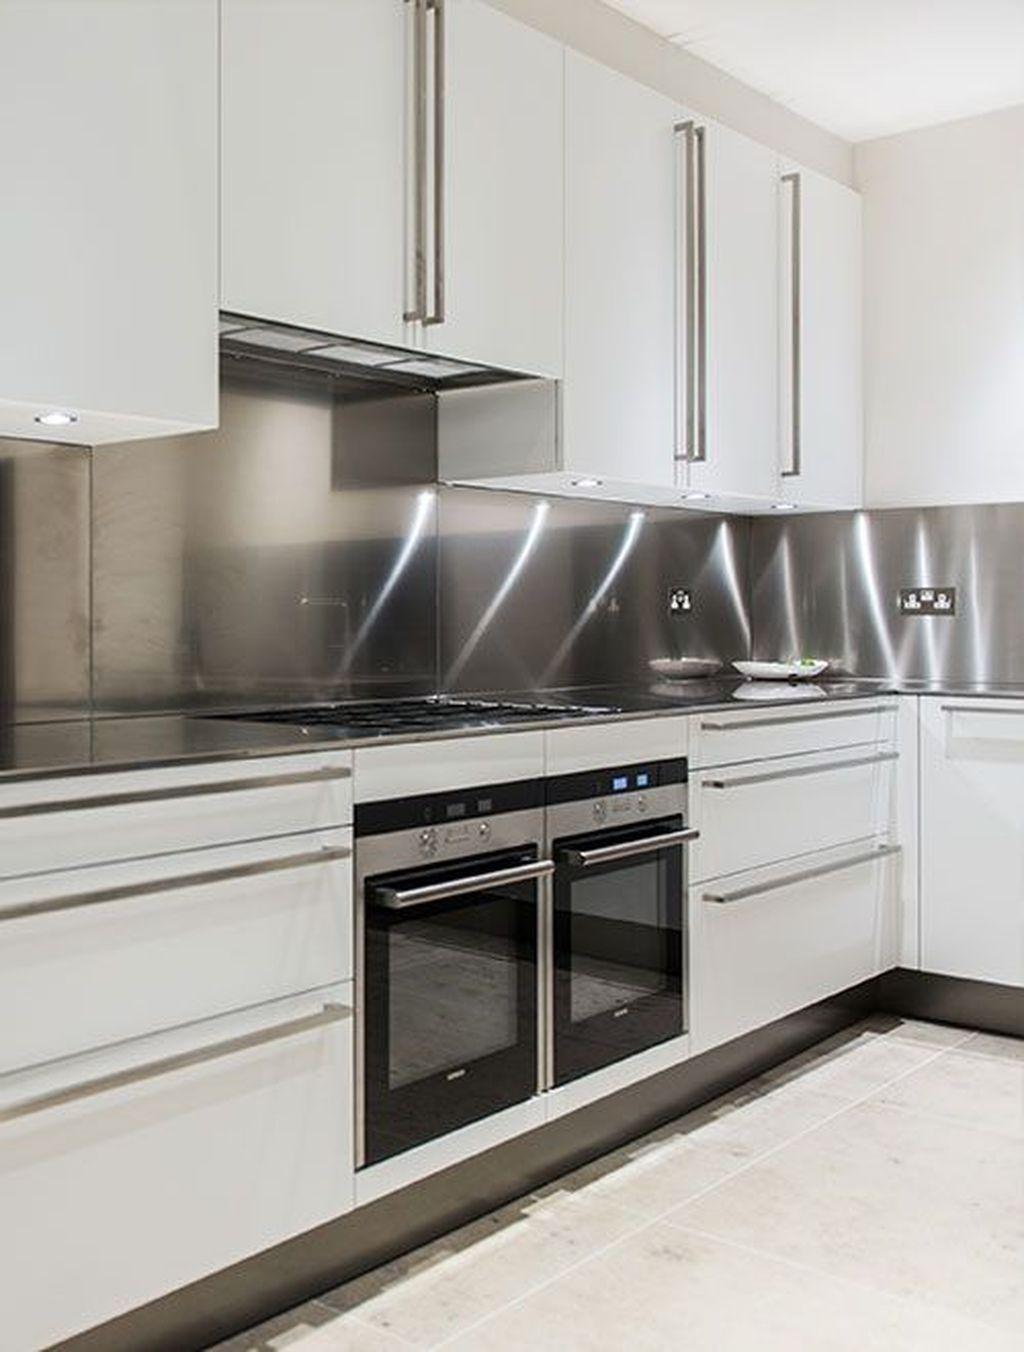 45 Creative Kitchen Cabinet Design Ideas With Stainless Steel Kitchen Cabinet Design Modern Kitchen Modern Kitchen Design